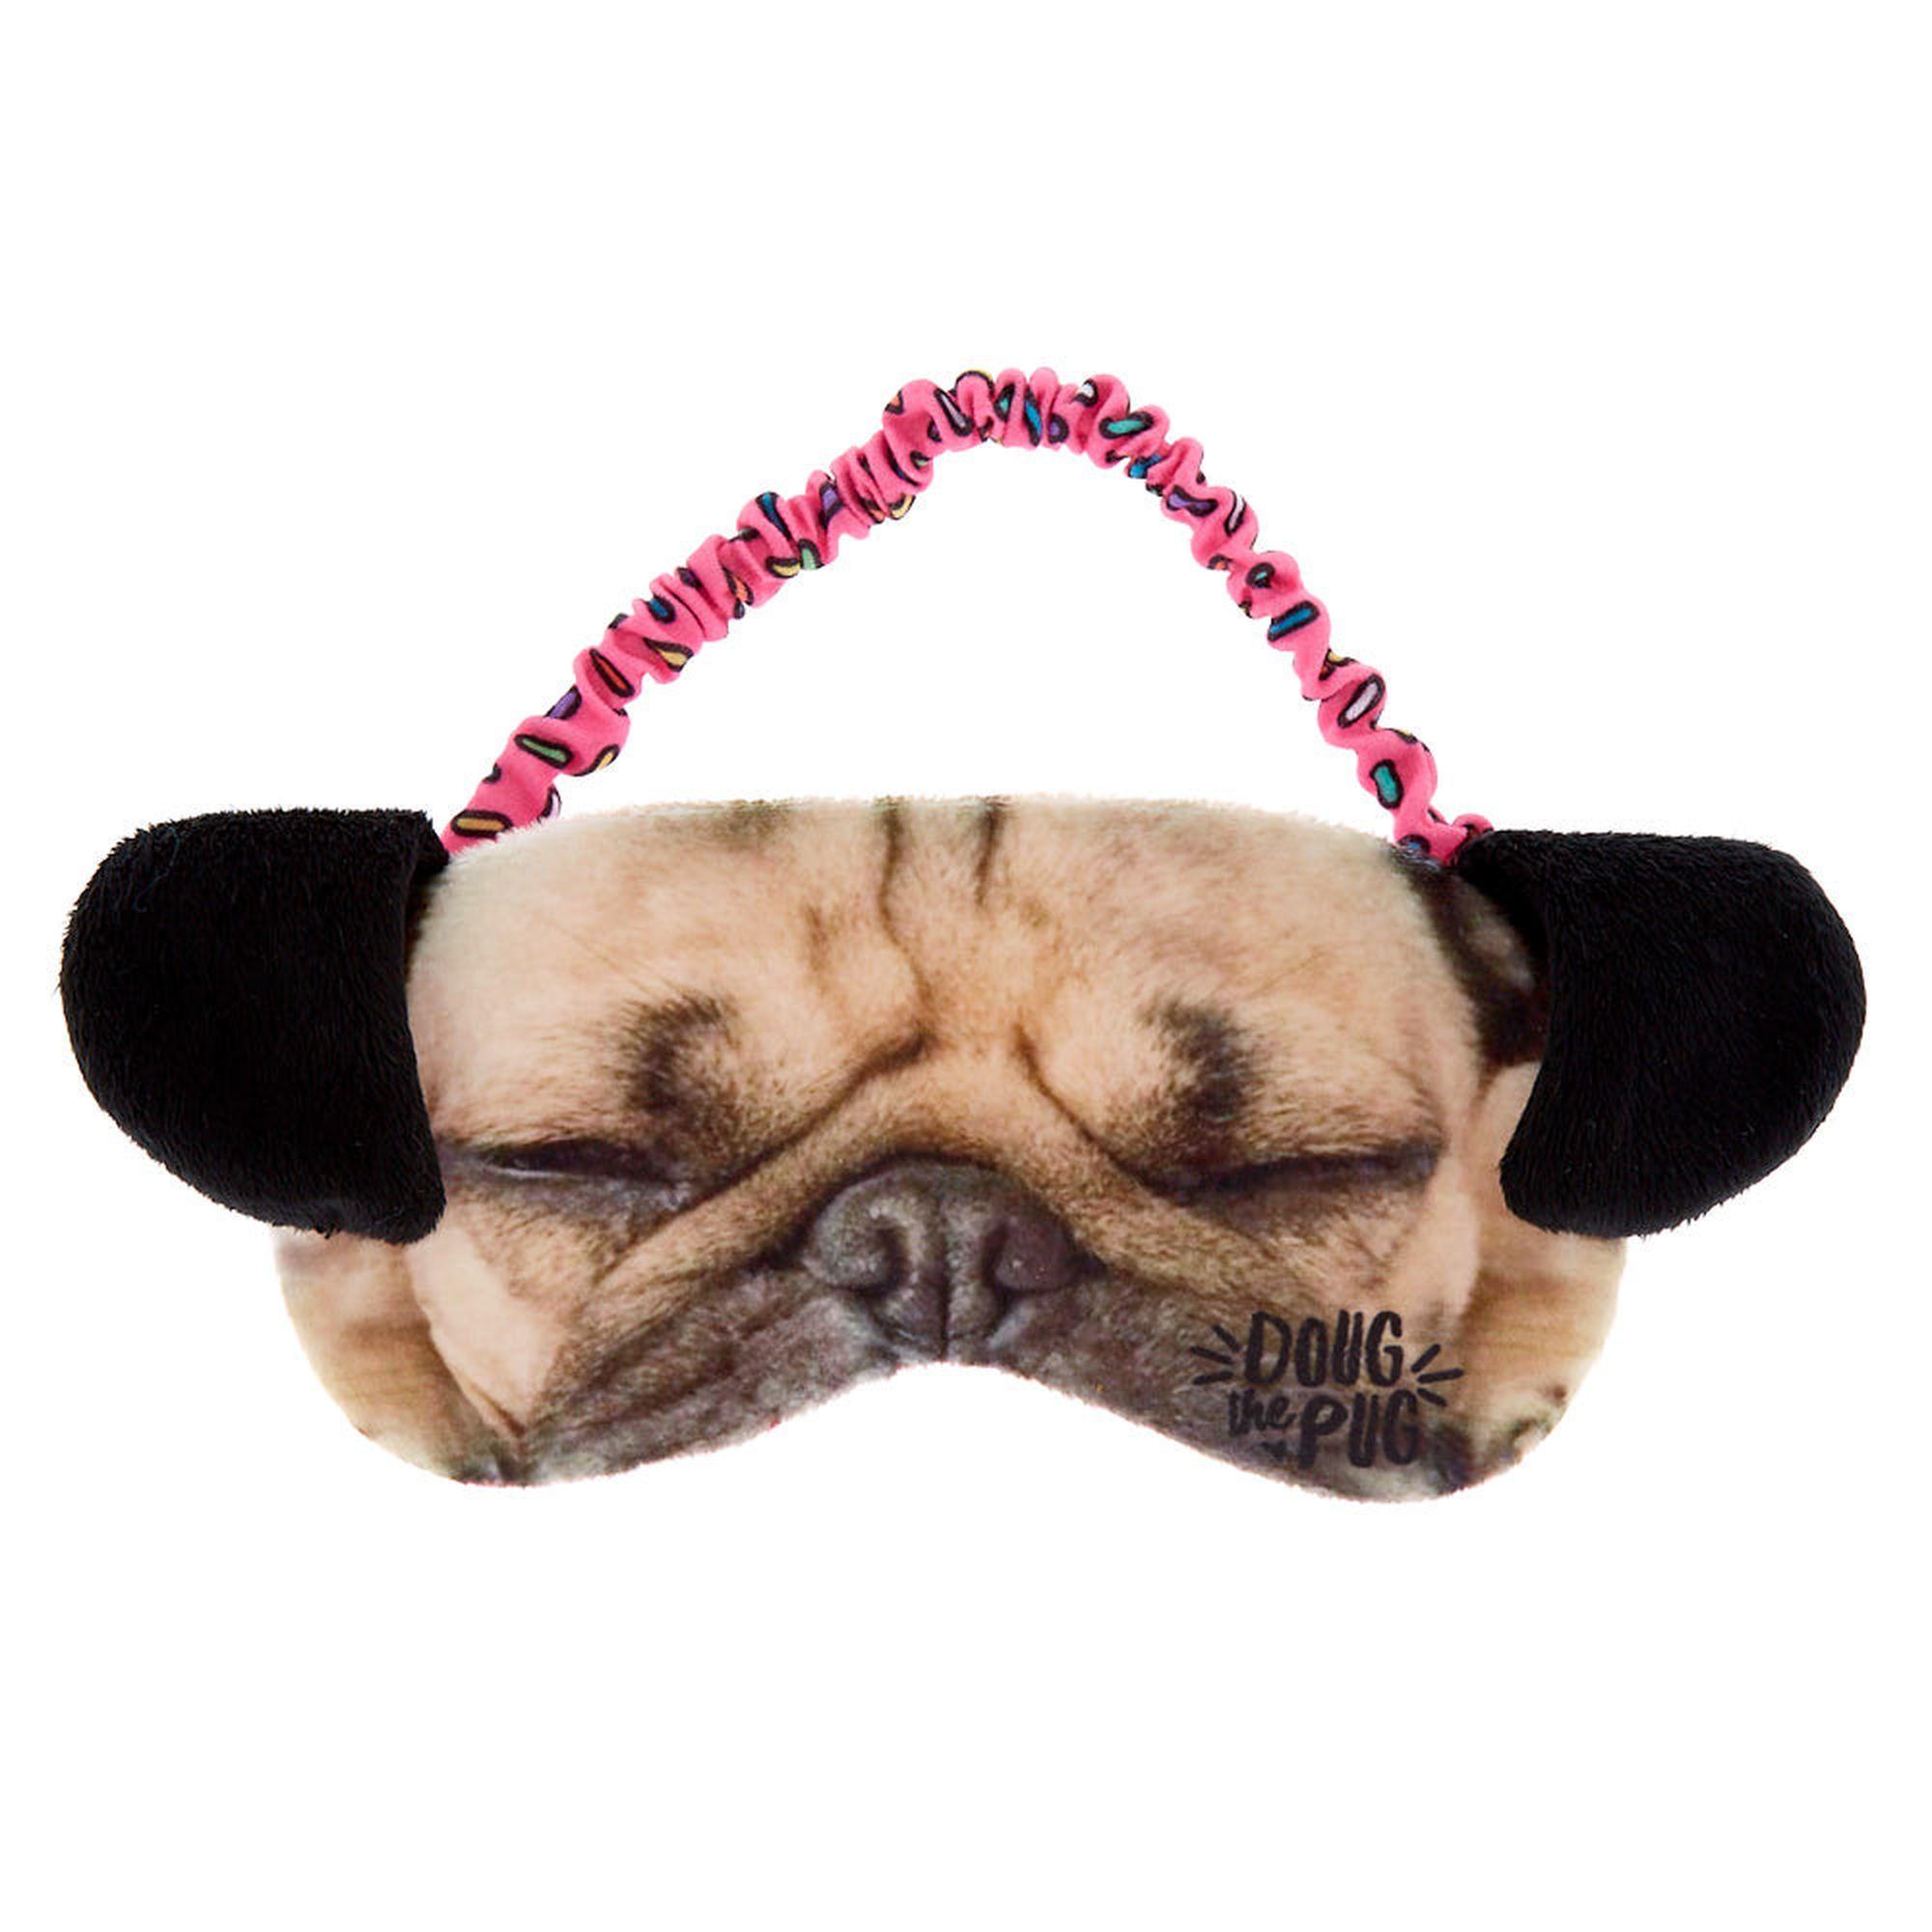 Doug The Pug Sleeping Mask Brown Fashion Accessories Jewelry